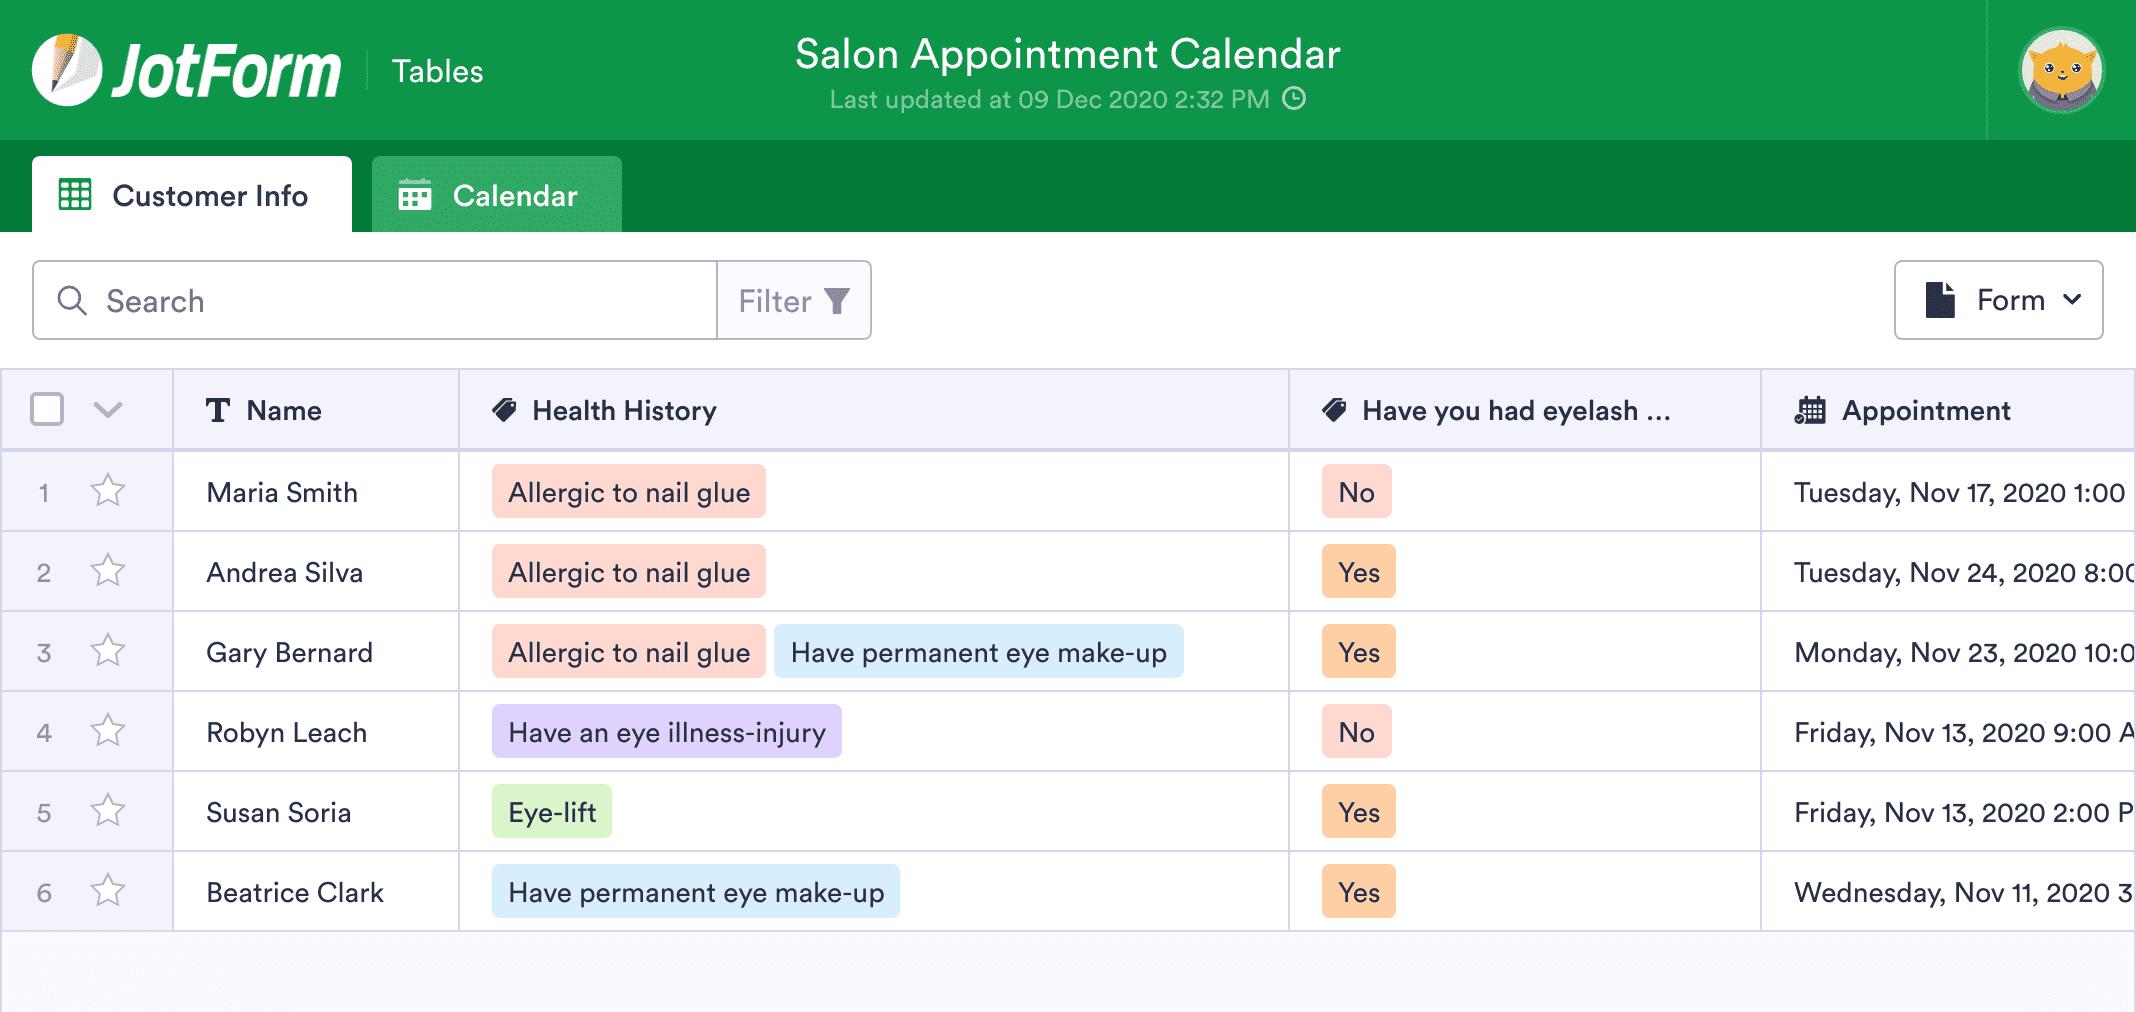 Salon Appointment Calendar